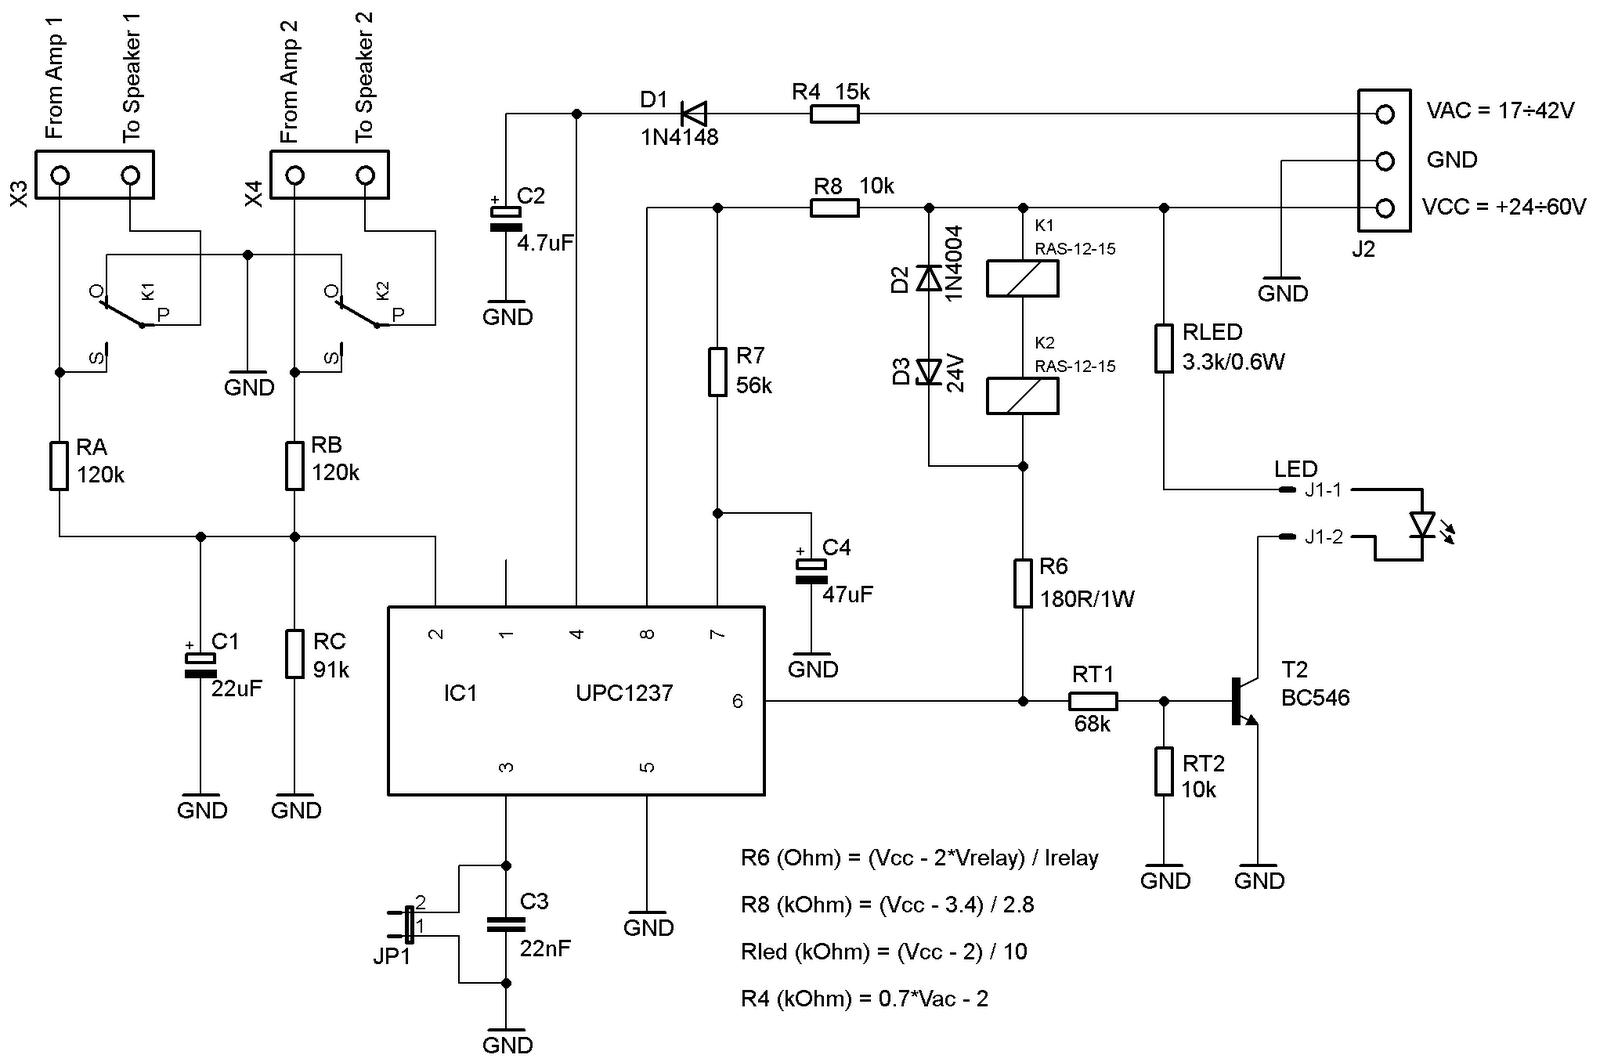 UPC1237 Für Hypex SMPS1200 DC Error - DIY-HIFI-Forum